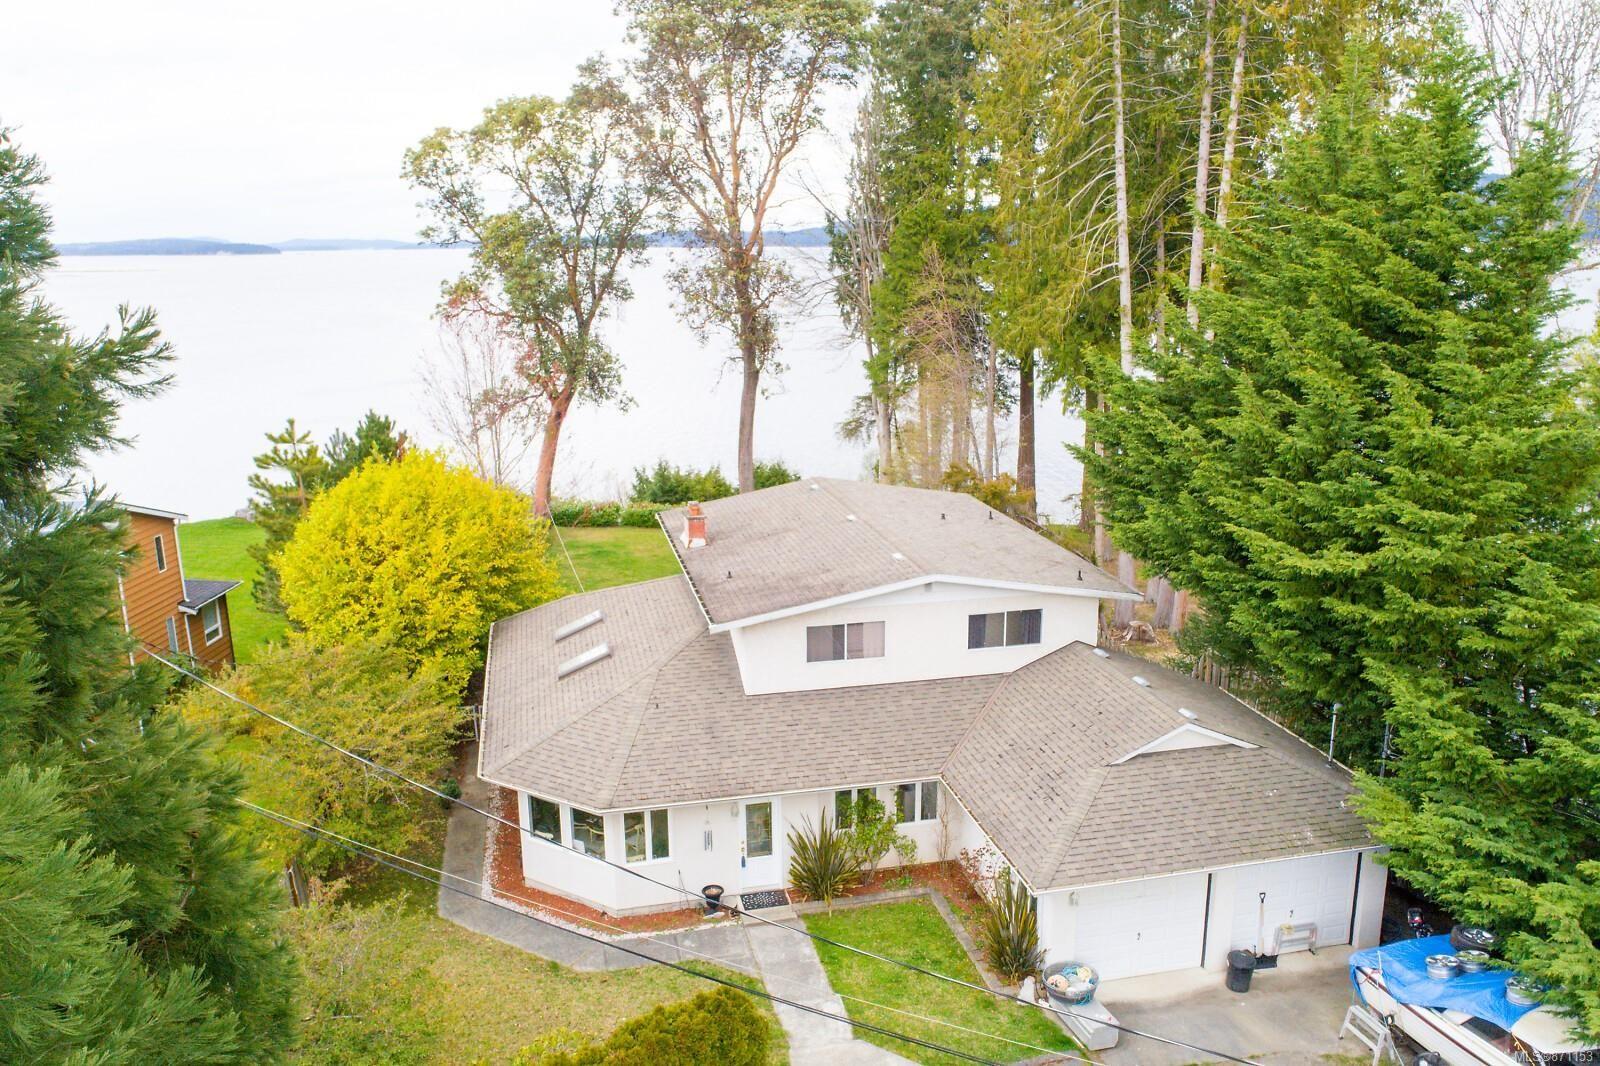 Main Photo: 1219 Barnes Rd in : Du Crofton House for sale (Duncan)  : MLS®# 871153